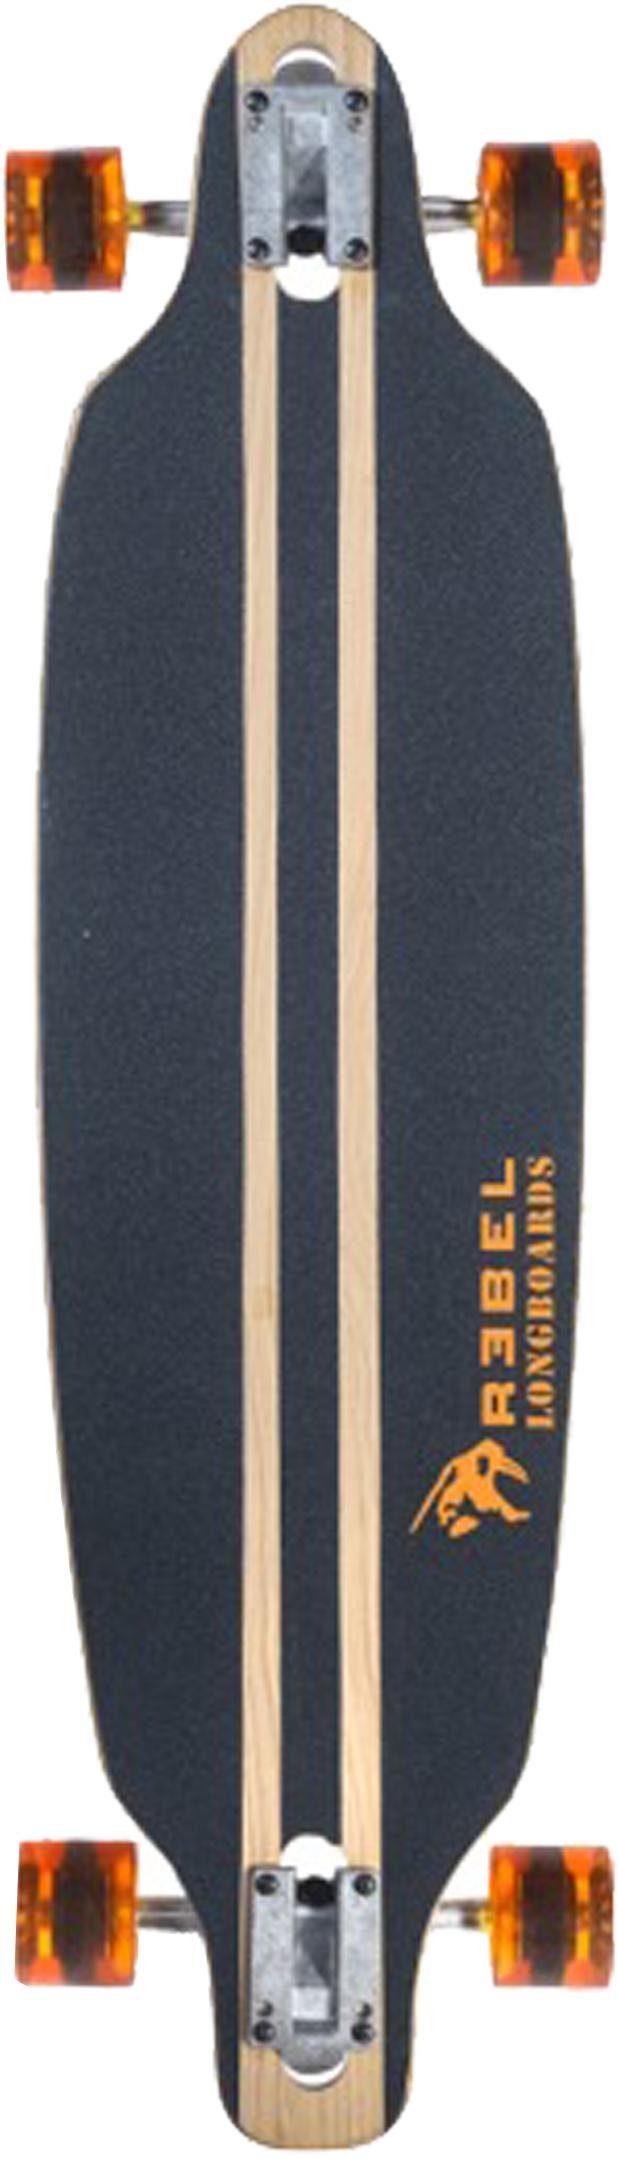 REBEL Longboard »Pacific Palisades orange«